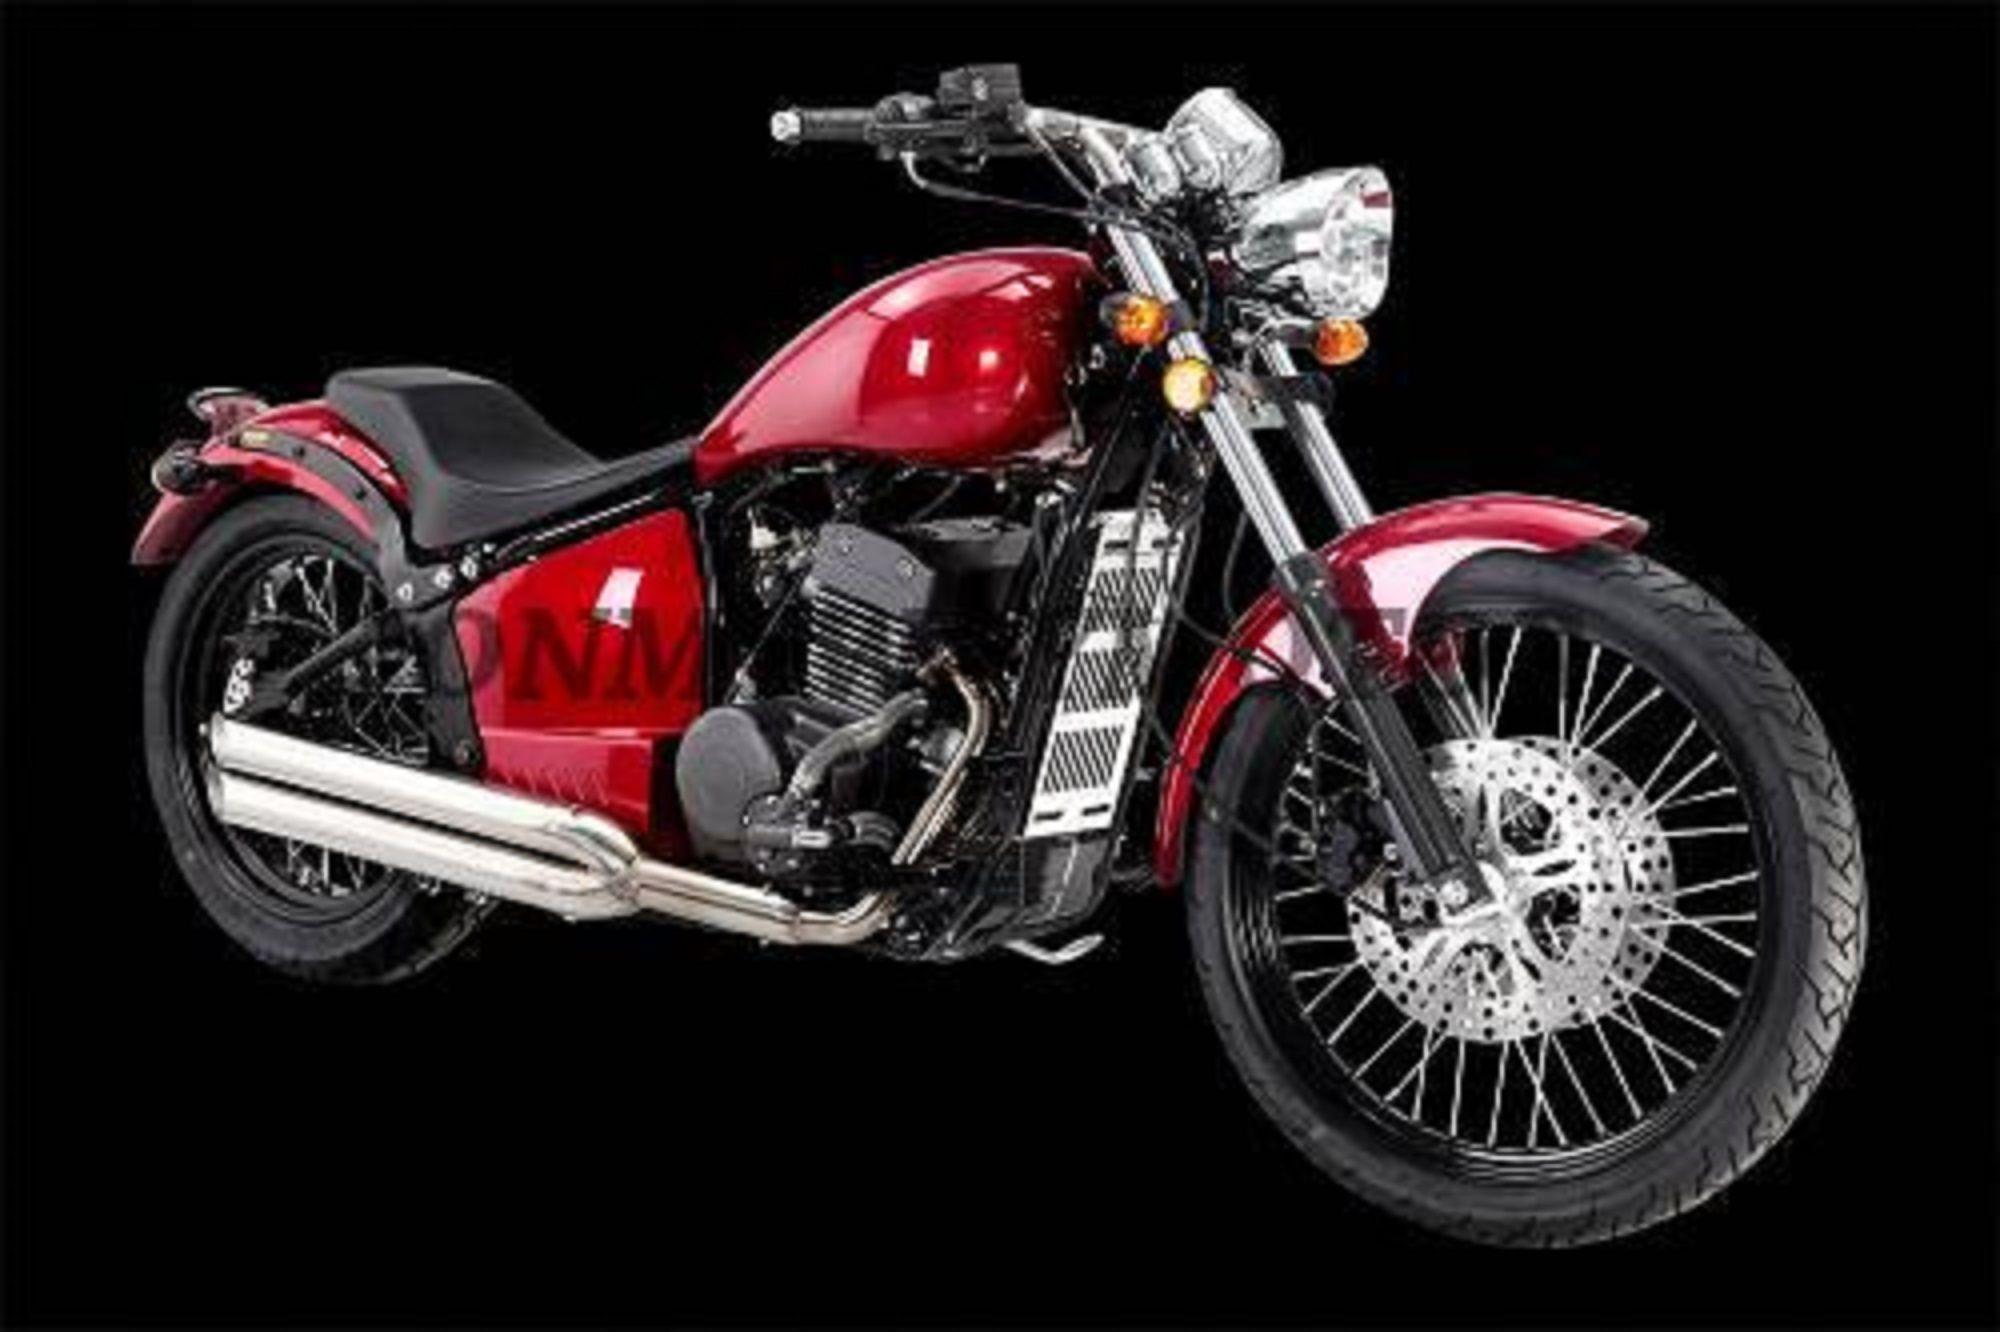 Pin by mohd Ansari on Johnny pag motorcycles | Motorcycle